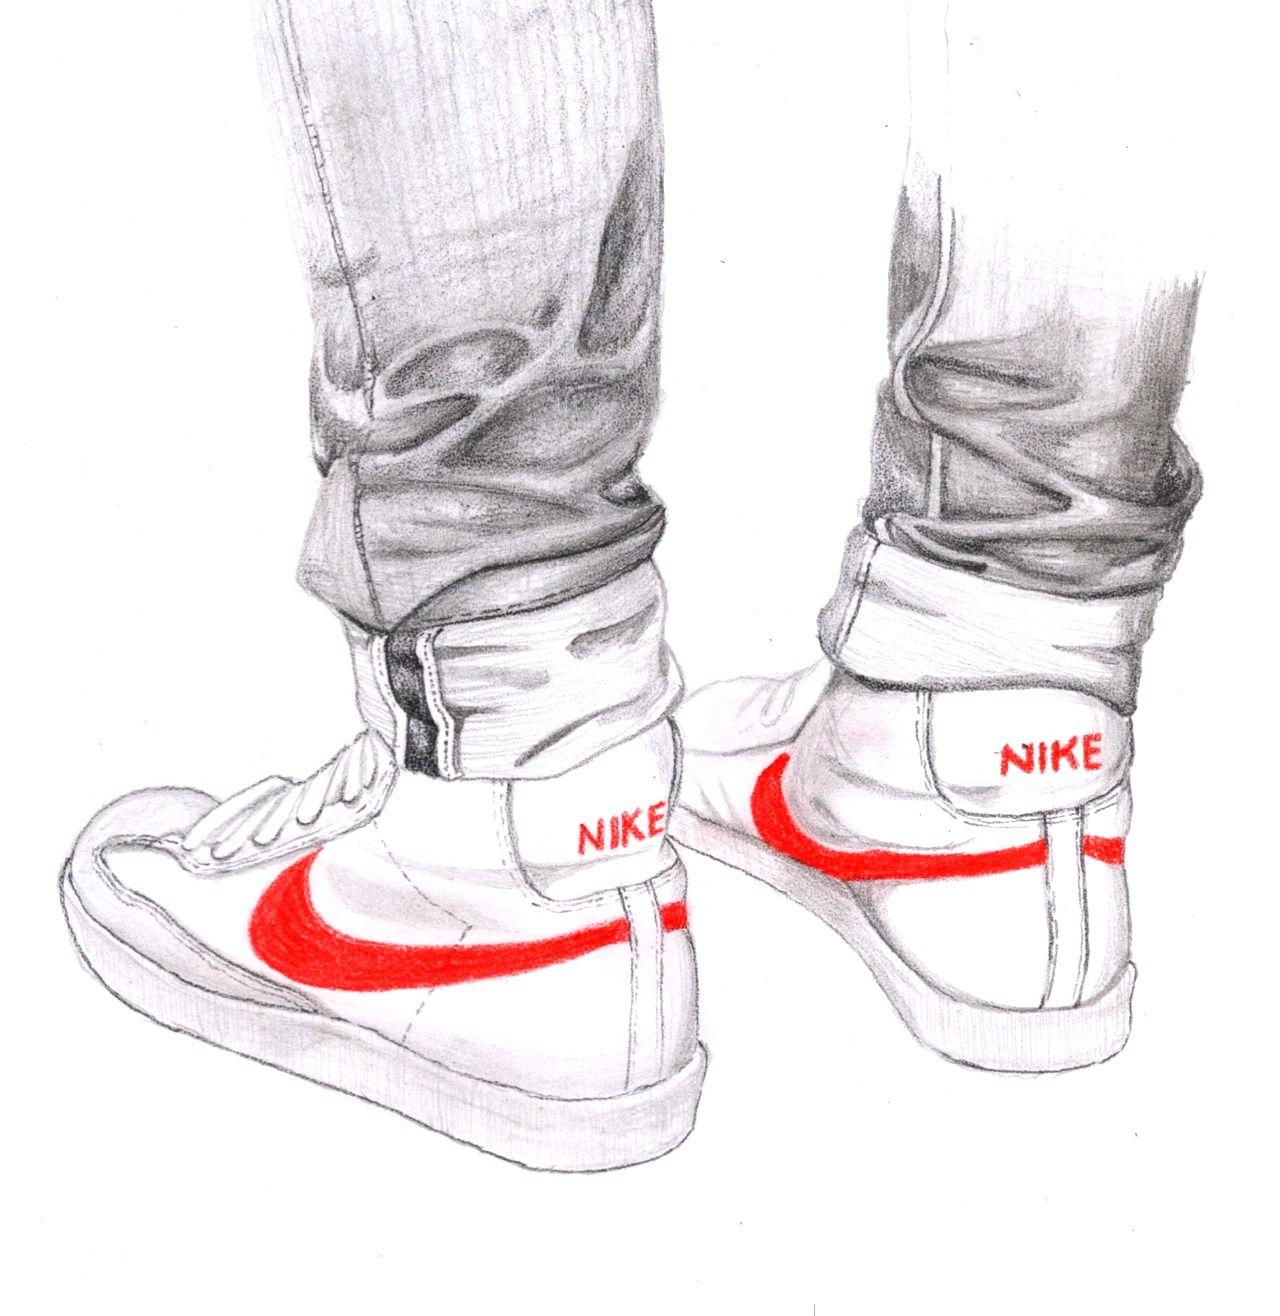 skinnies & nikes. Nike DrawingDrawing LegsDrawing PinFigure DrawingArt  ShoesShoe ...